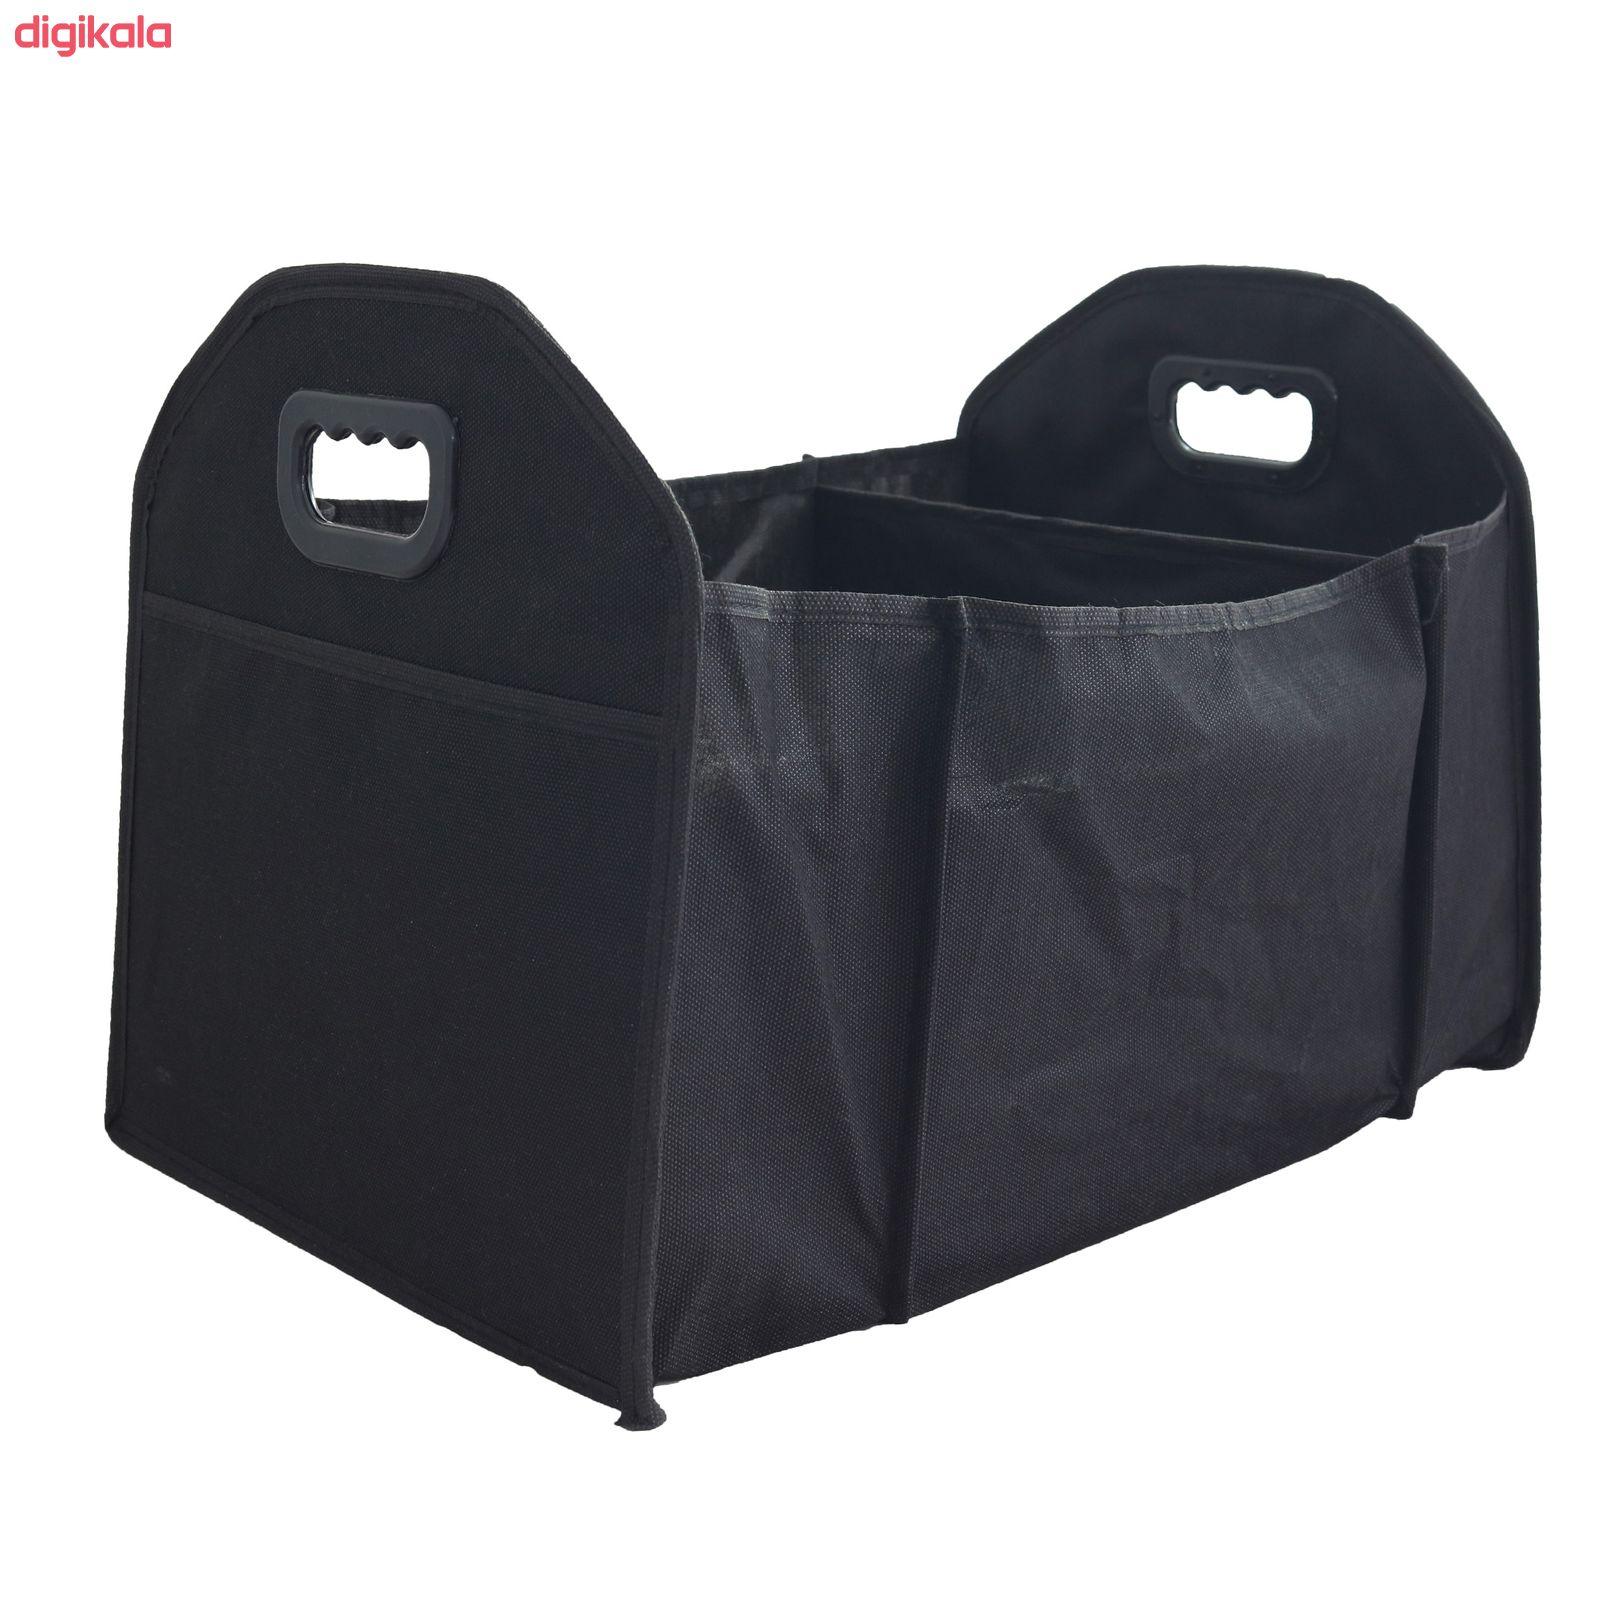 نظم دهنده صندوق عقب خودرو مدل BlBox main 1 4